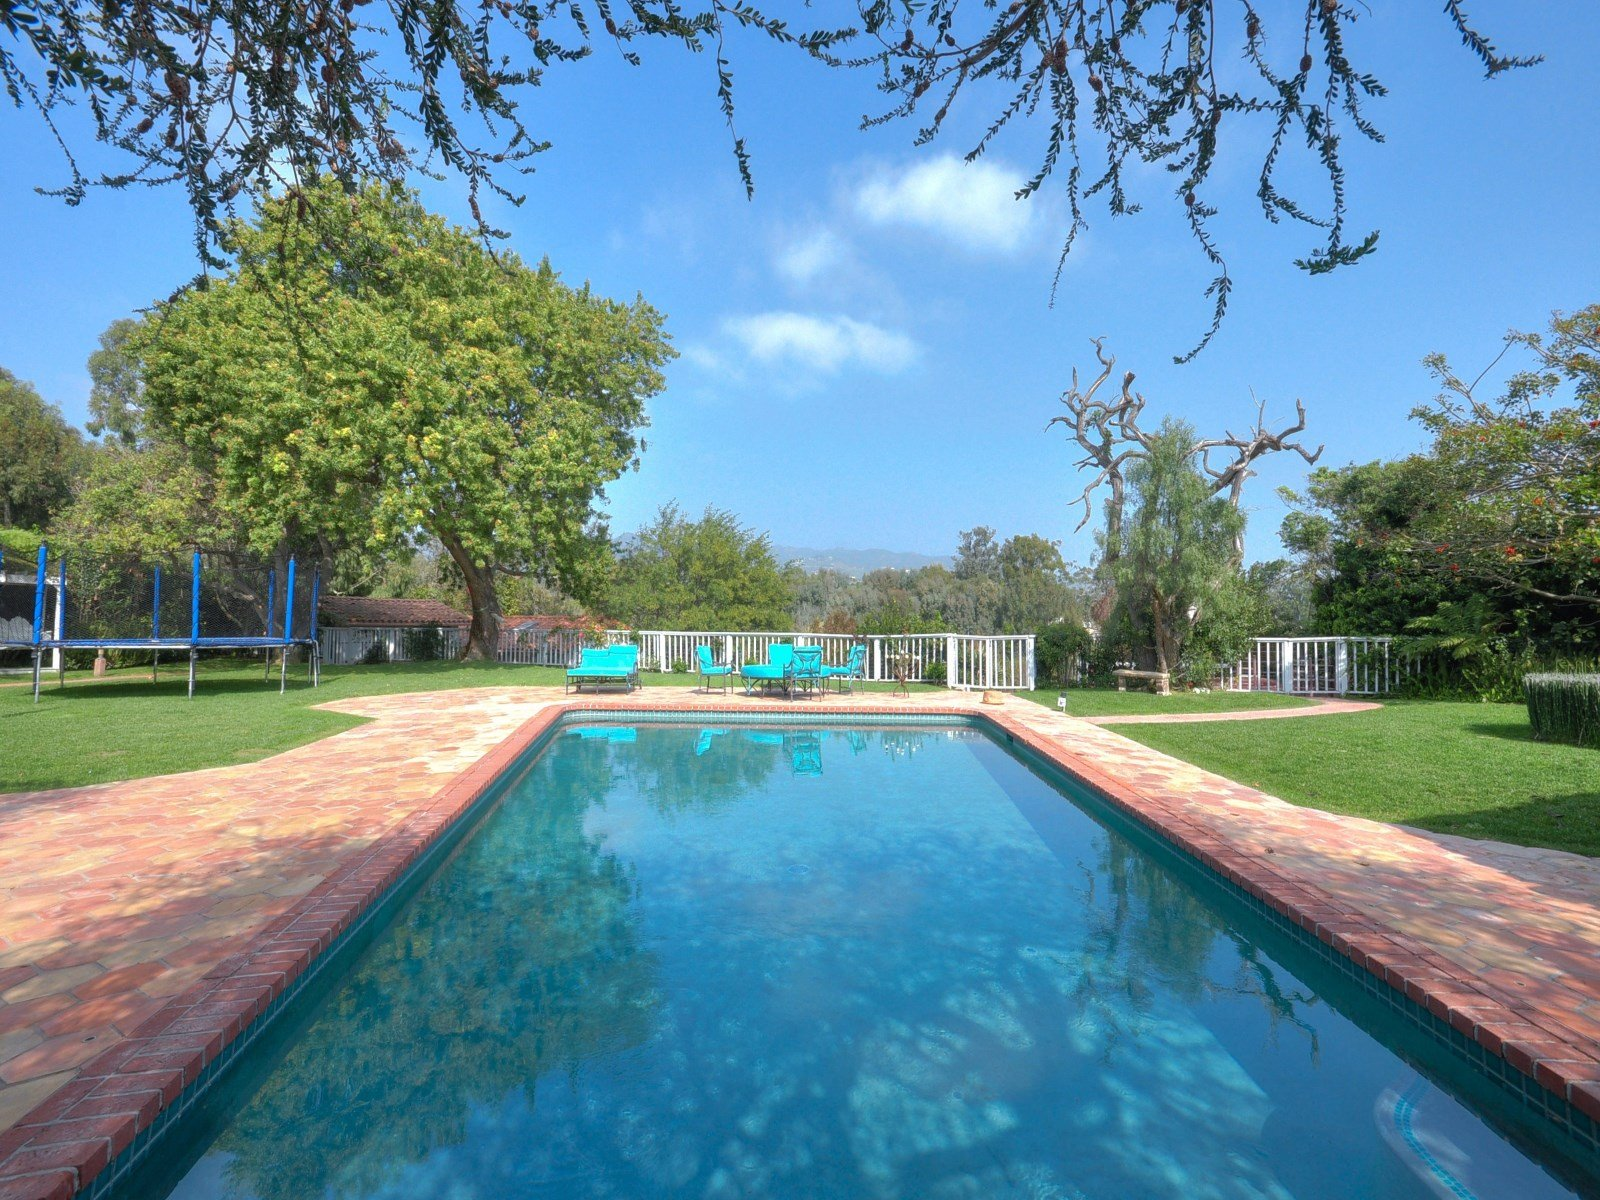 Pool - Spanish ranch house in Malibu CA - Sean Penn house